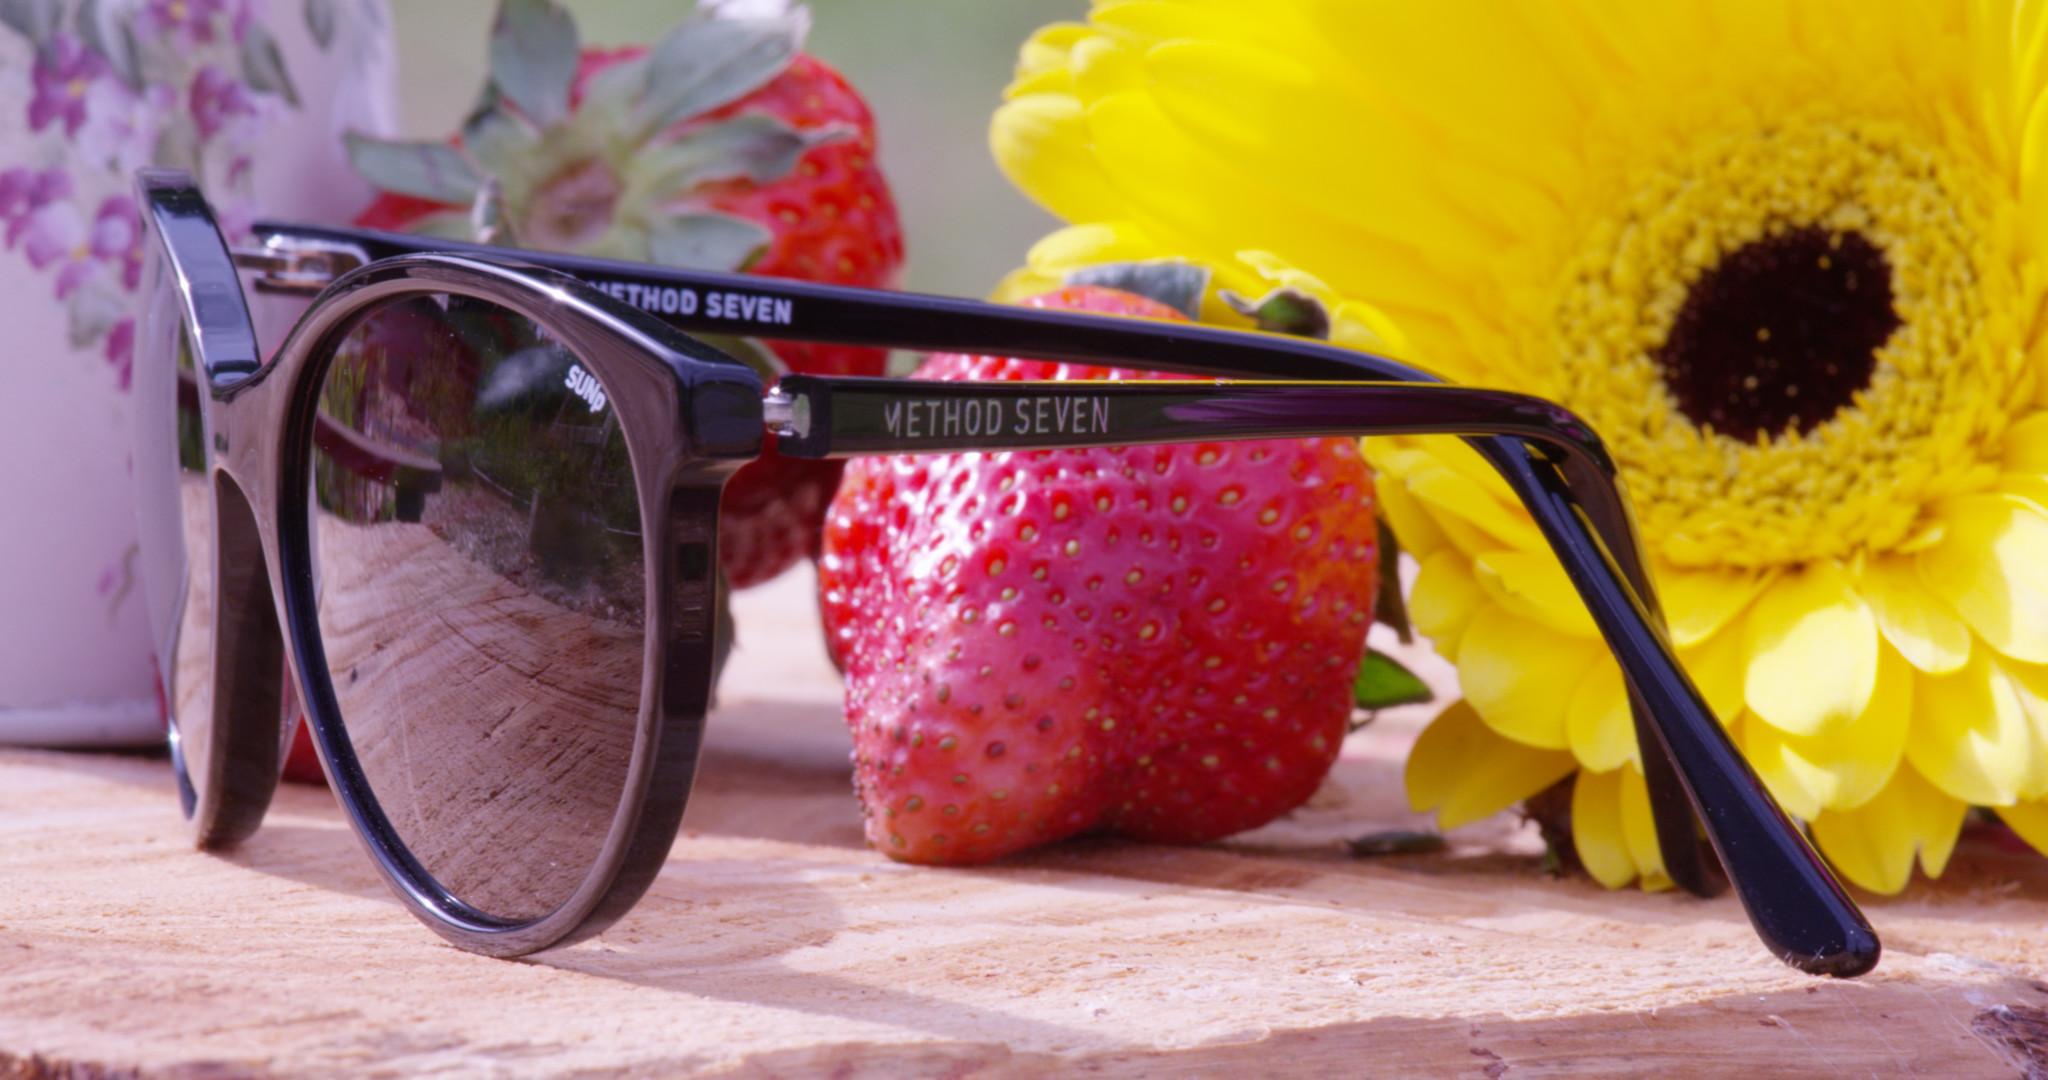 Press Release: Method Seven Launches Women's Grow Glasses